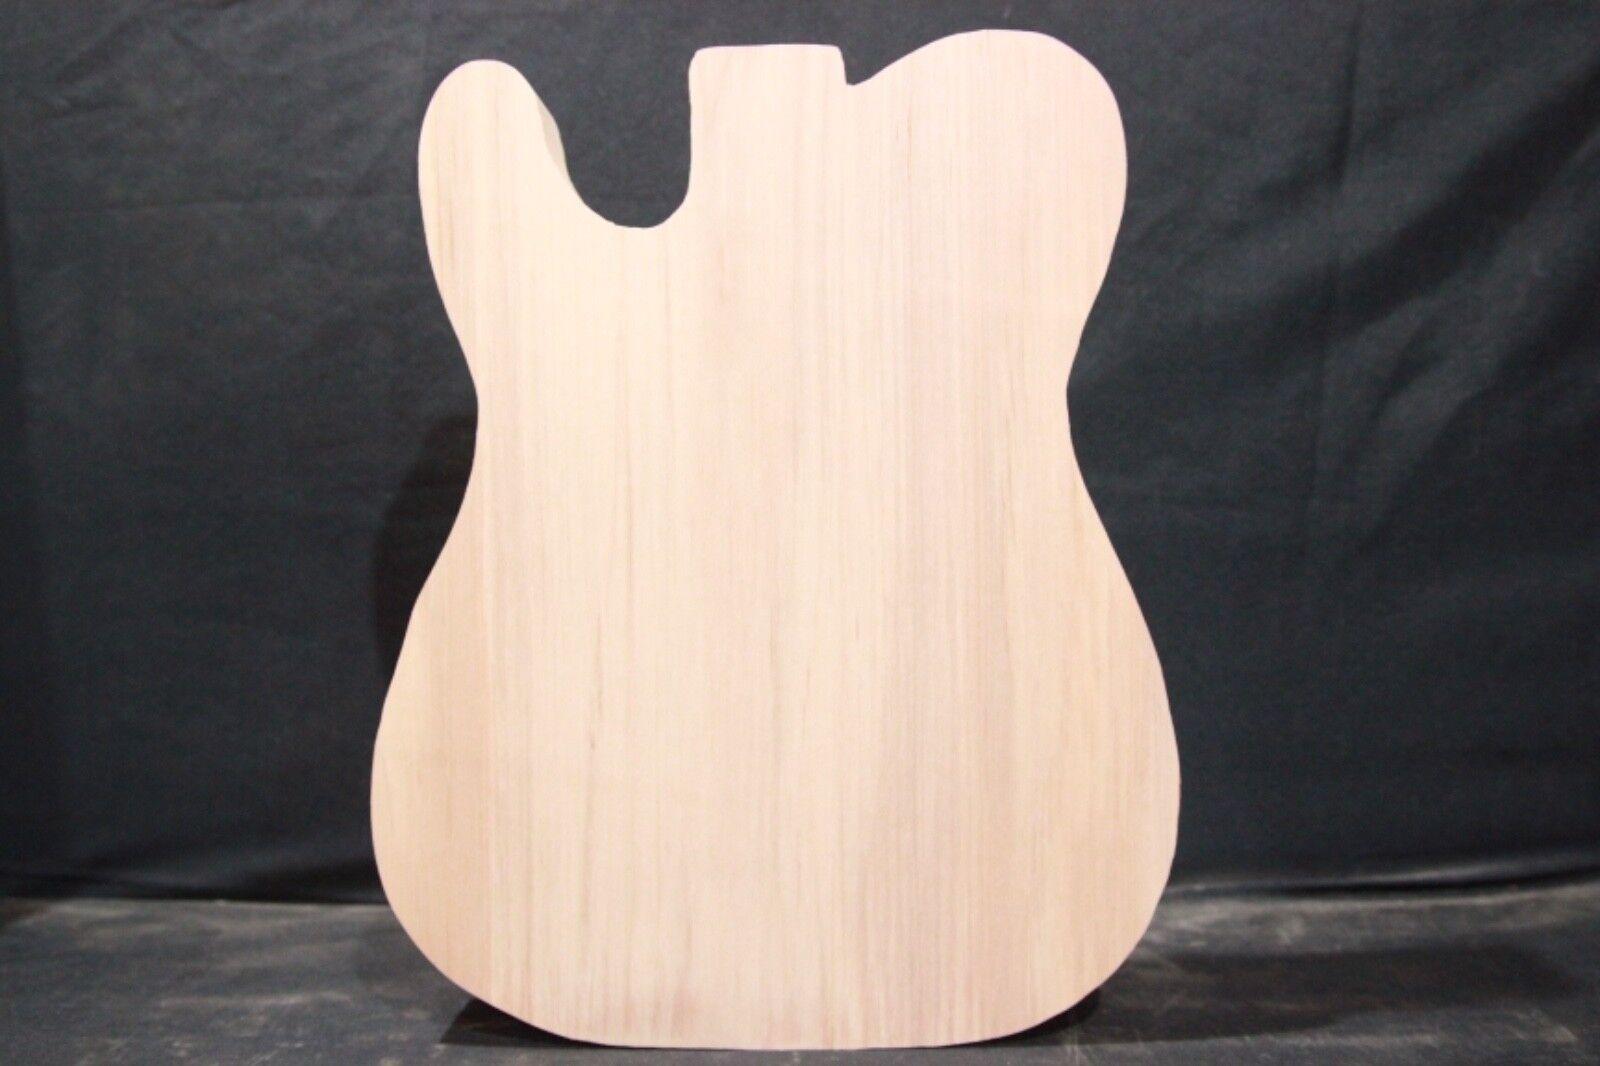 Alder  1-piece guitar body blank   Cut to